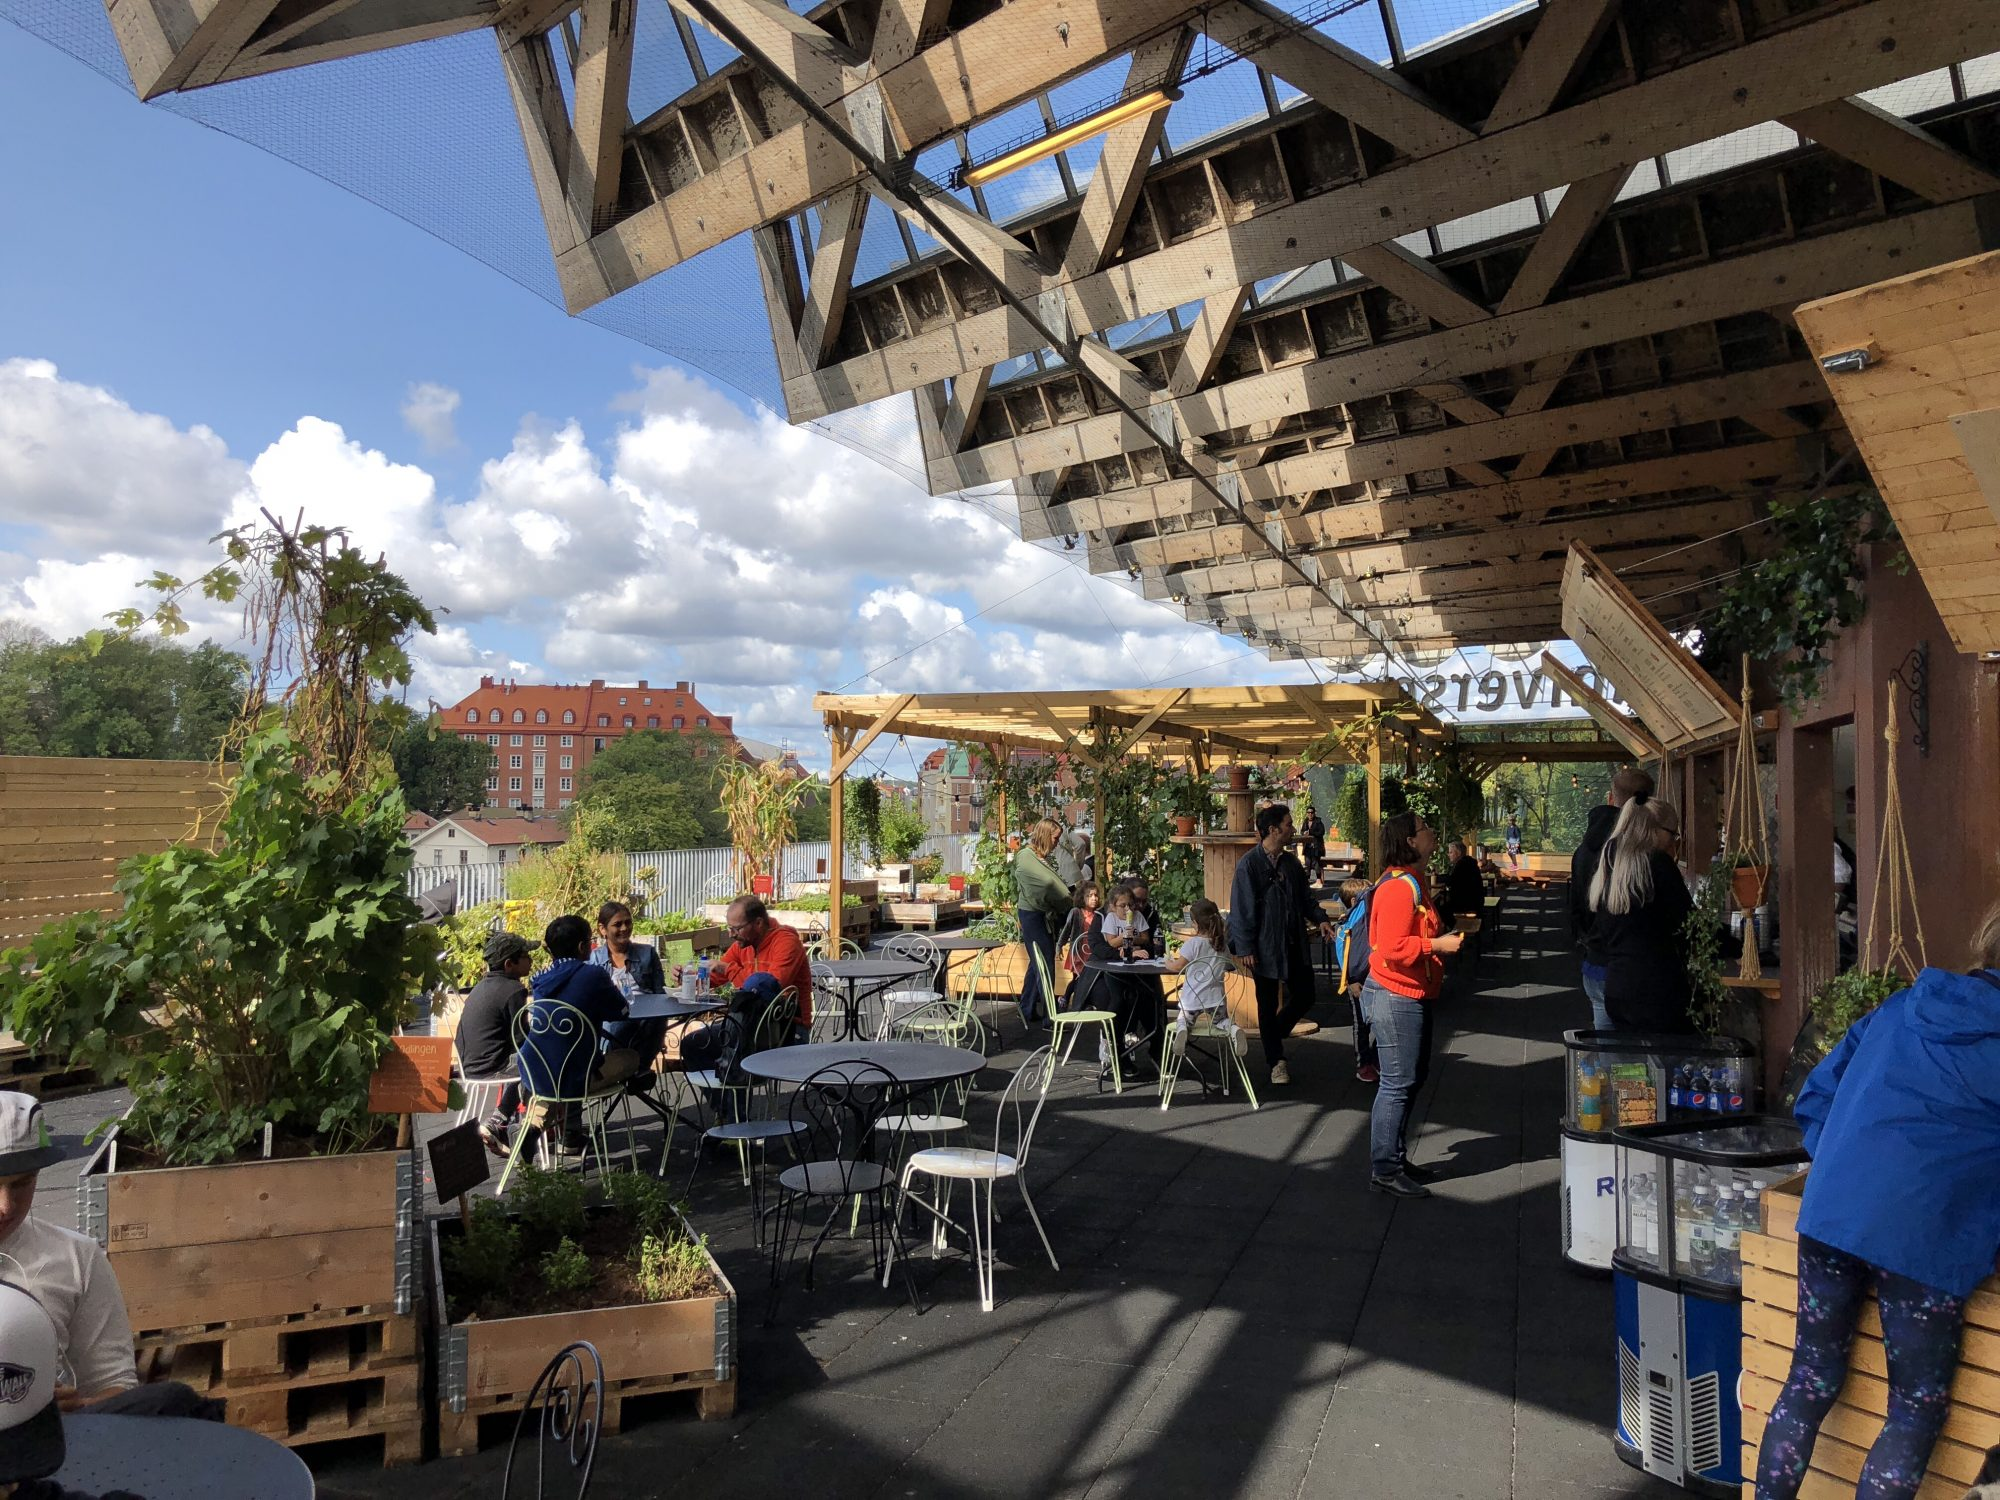 Universeum i Göteborg Restaurang